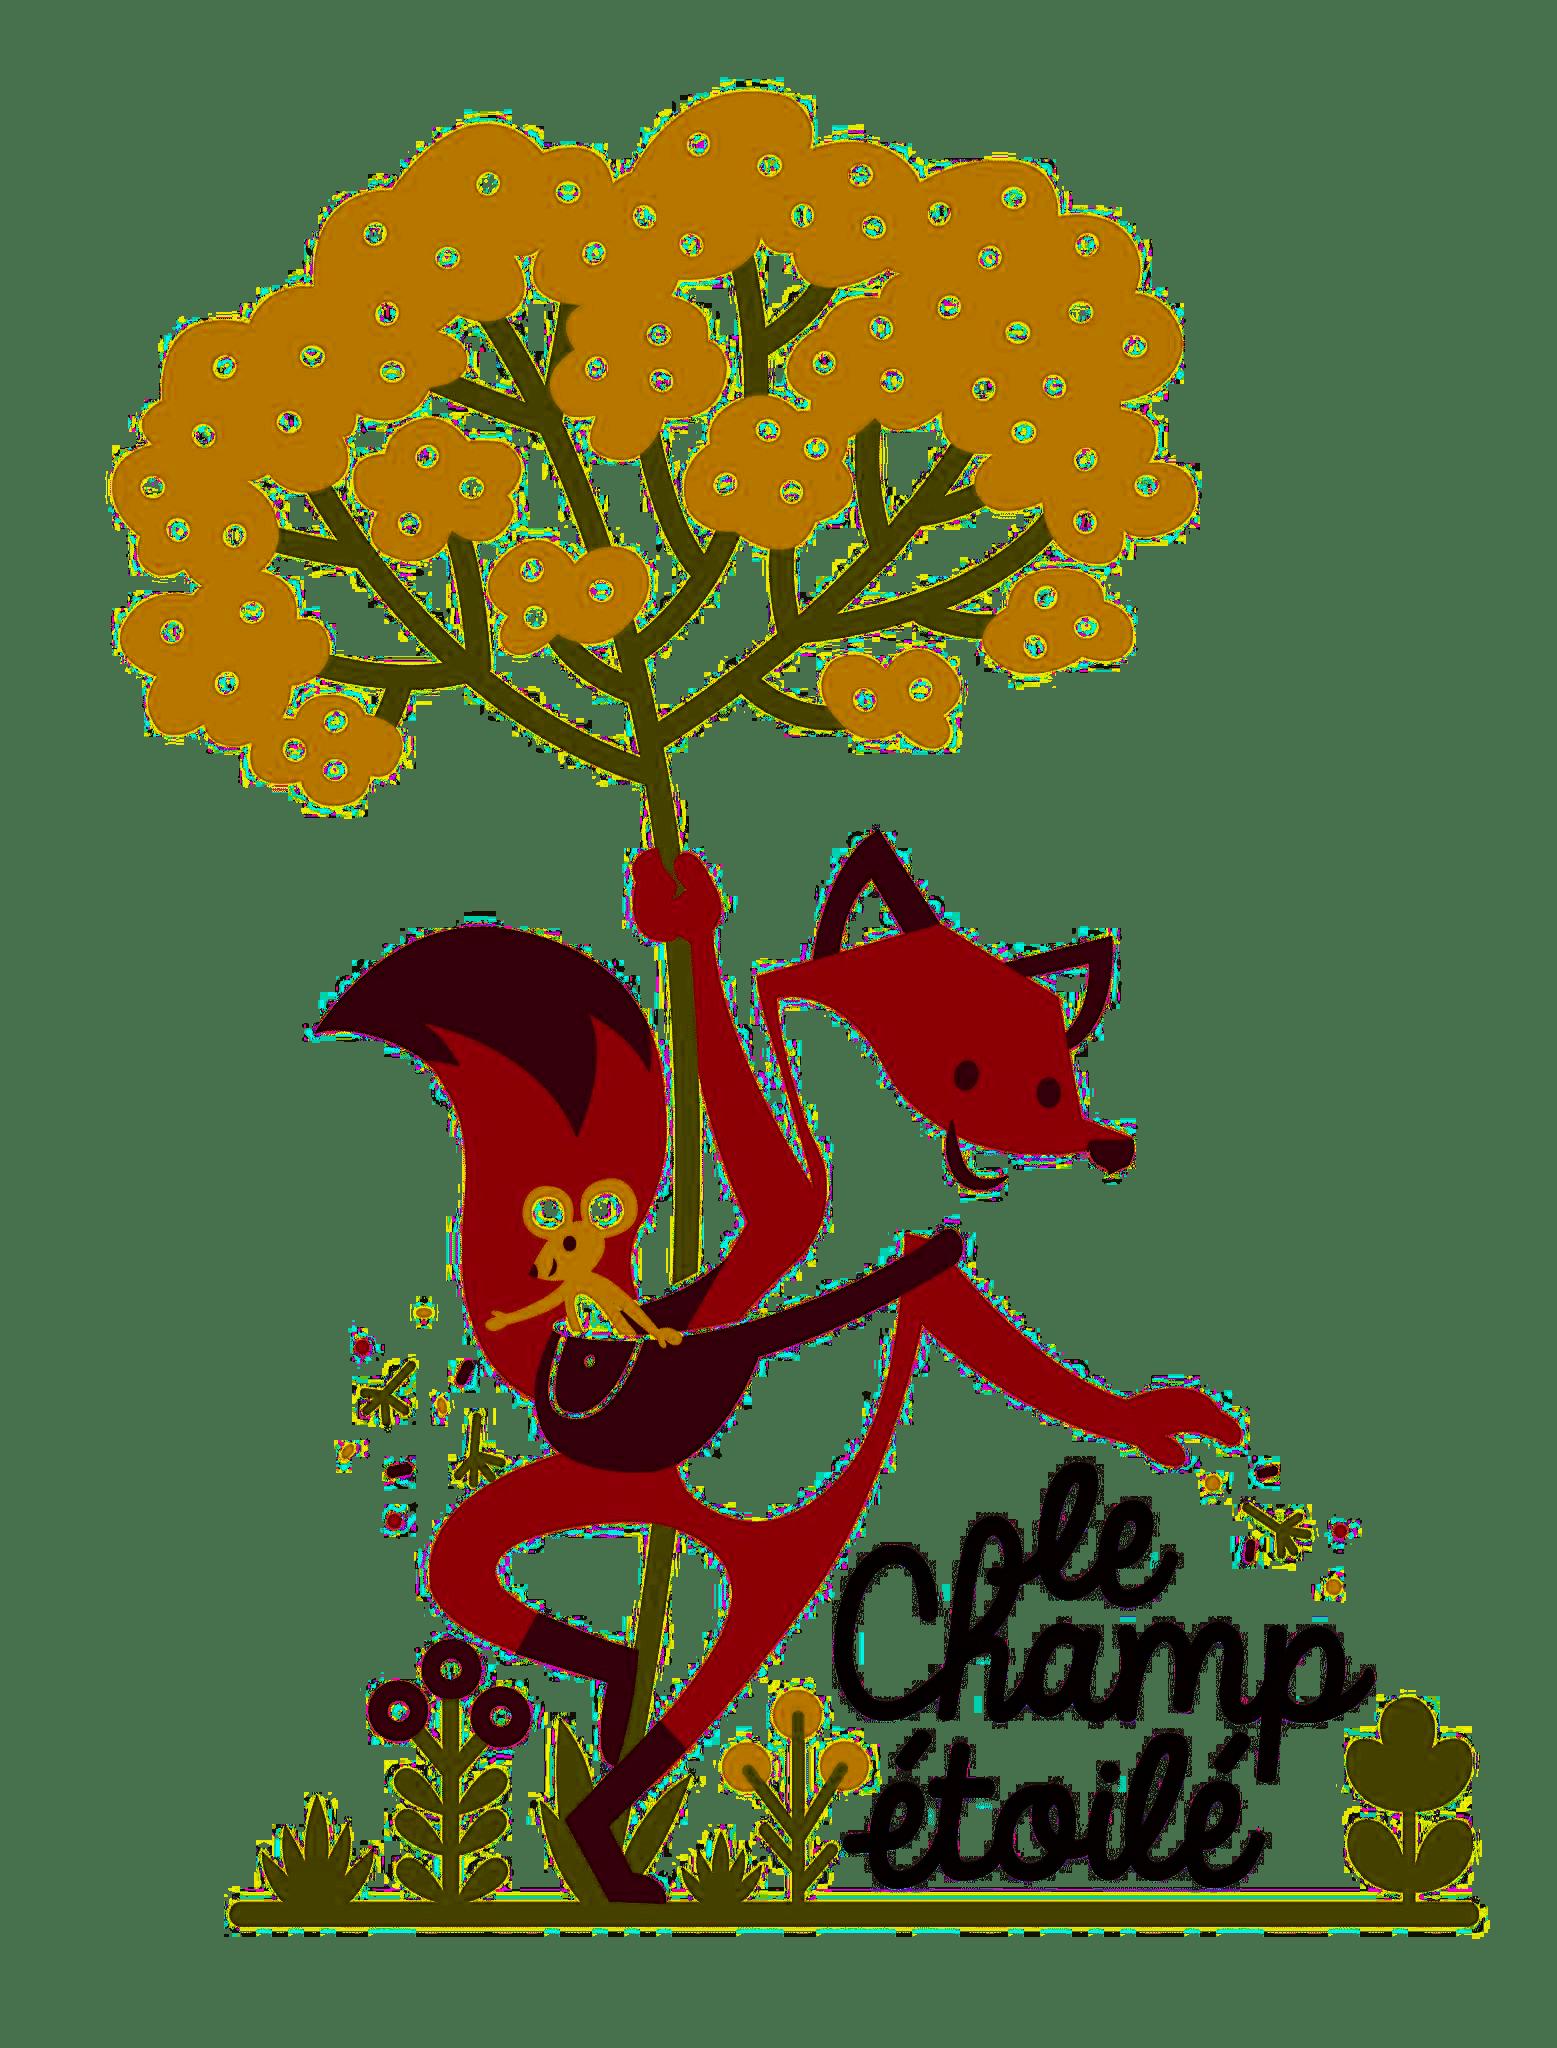 Logo Le Champ étoilé